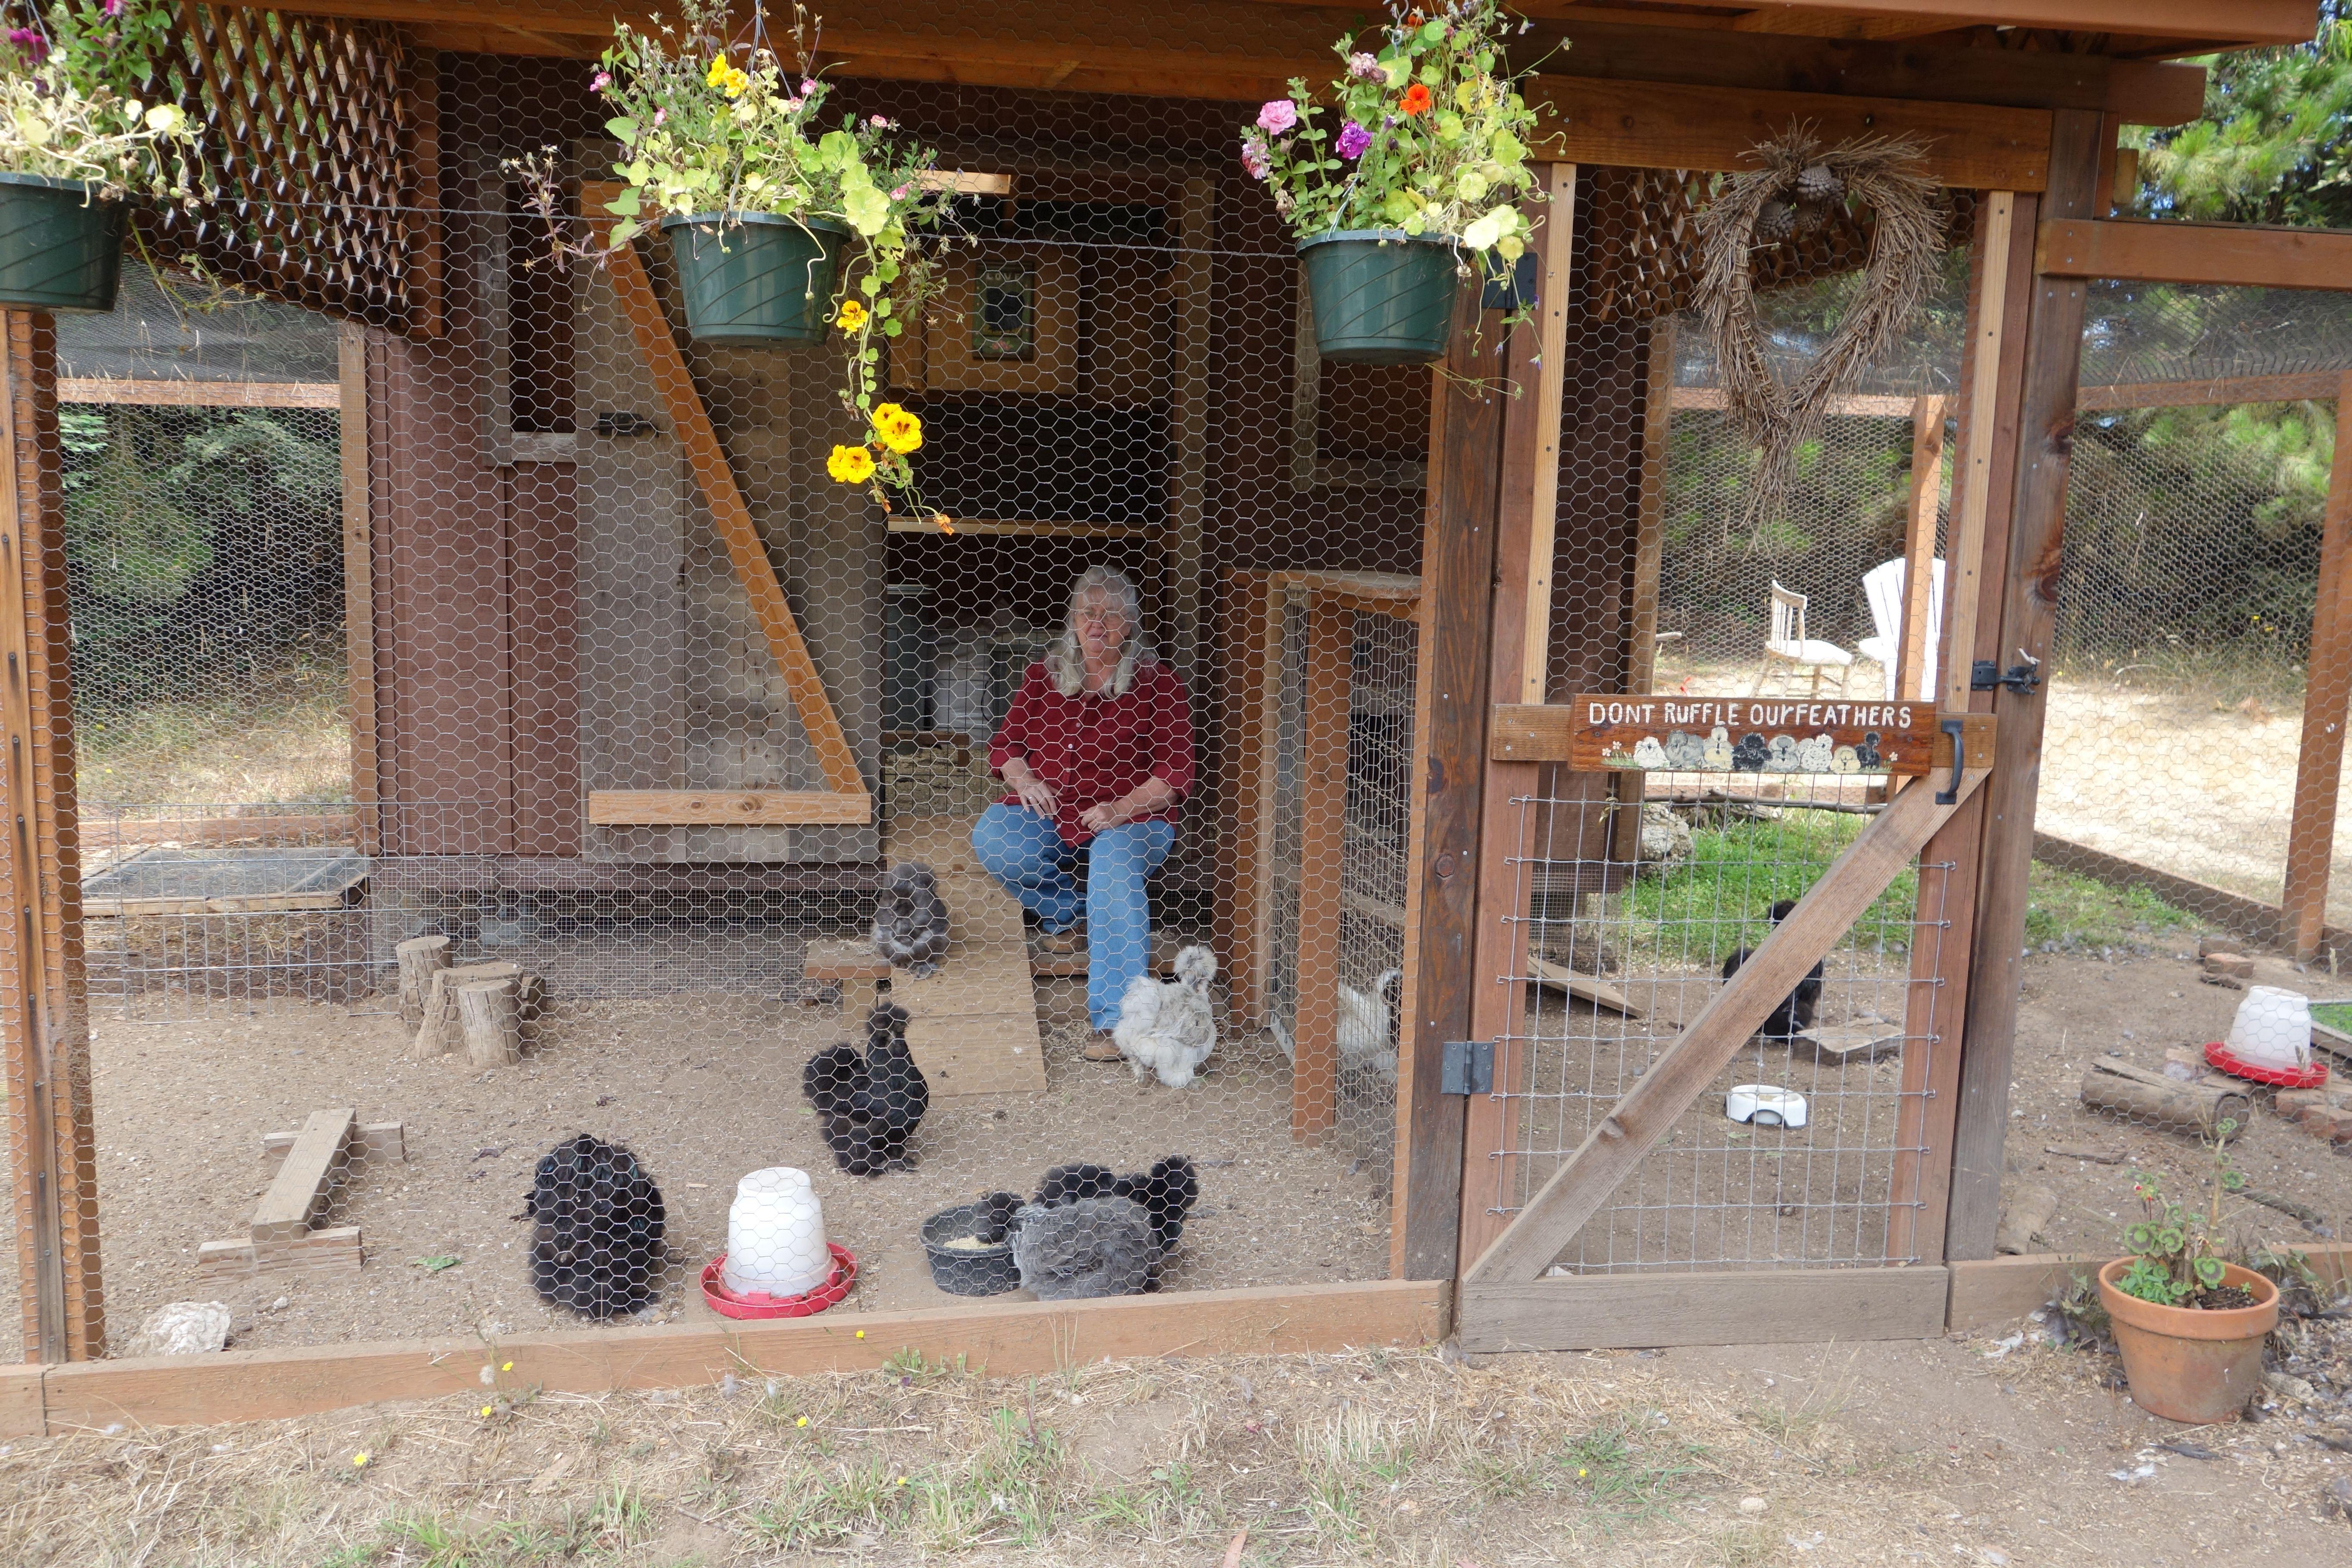 The Silkie Coop Serama Chicken Coops